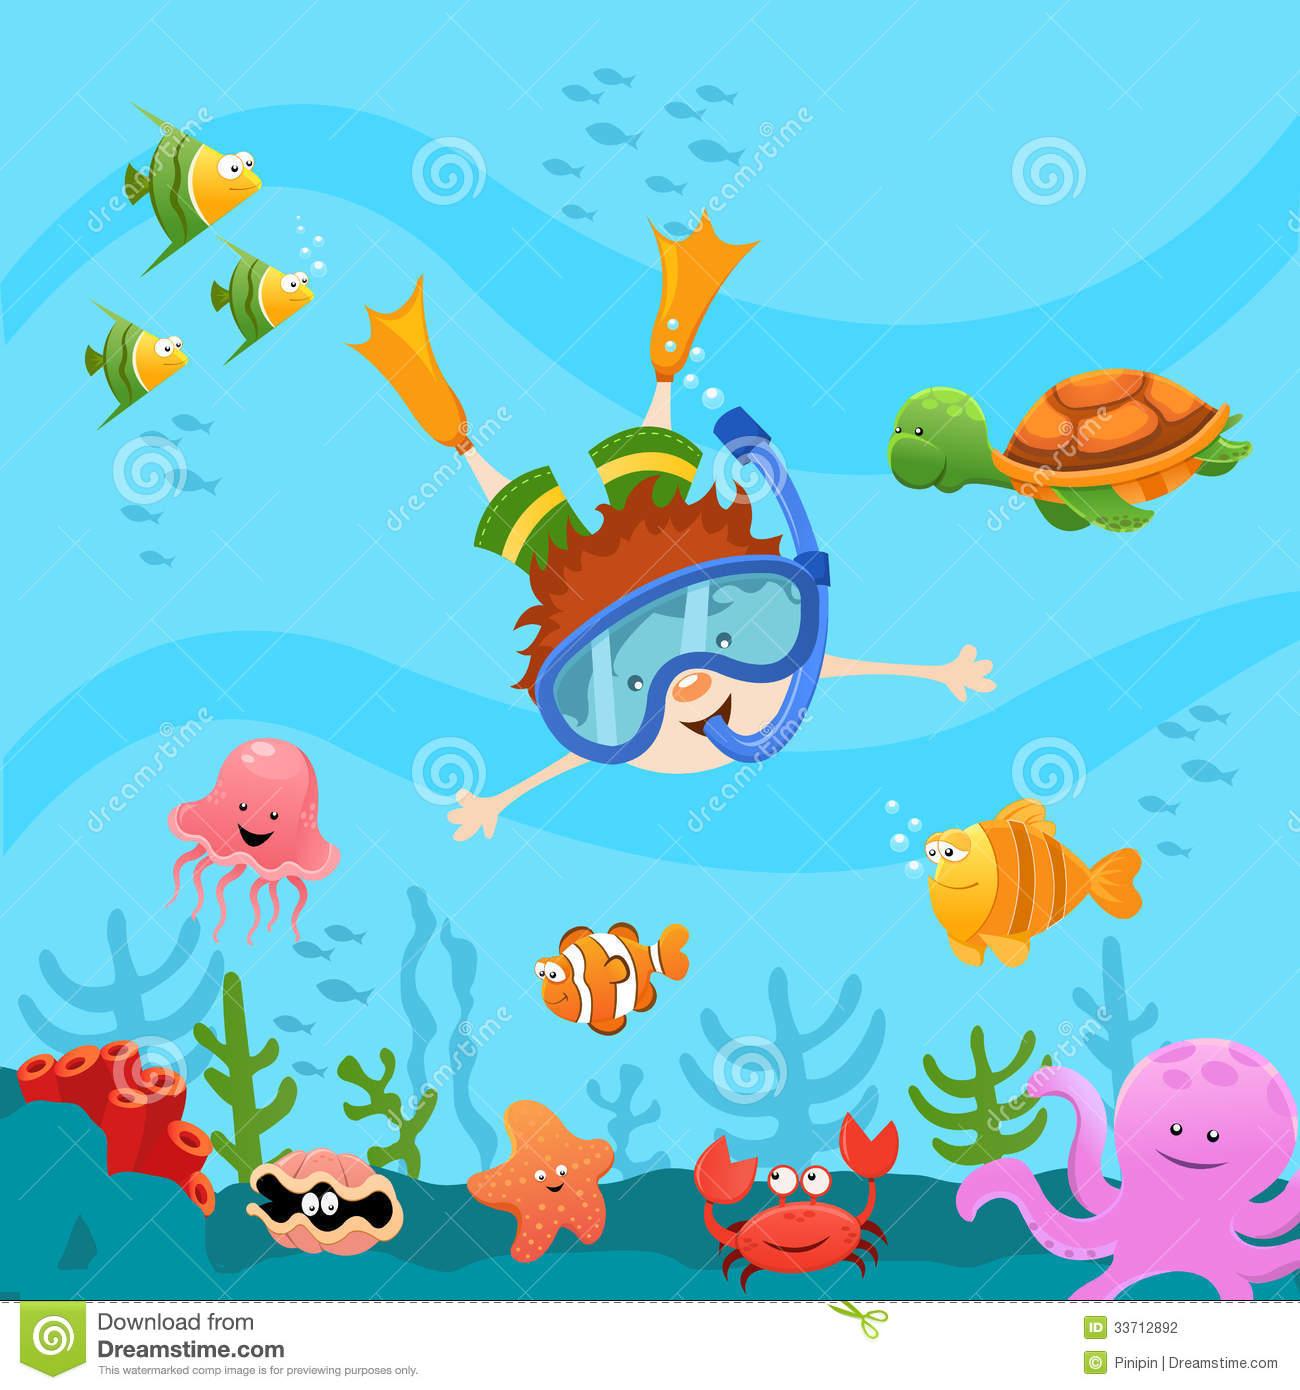 Clipart Ocean And Explore The Ocean-Clipart Ocean And Explore The Ocean-7